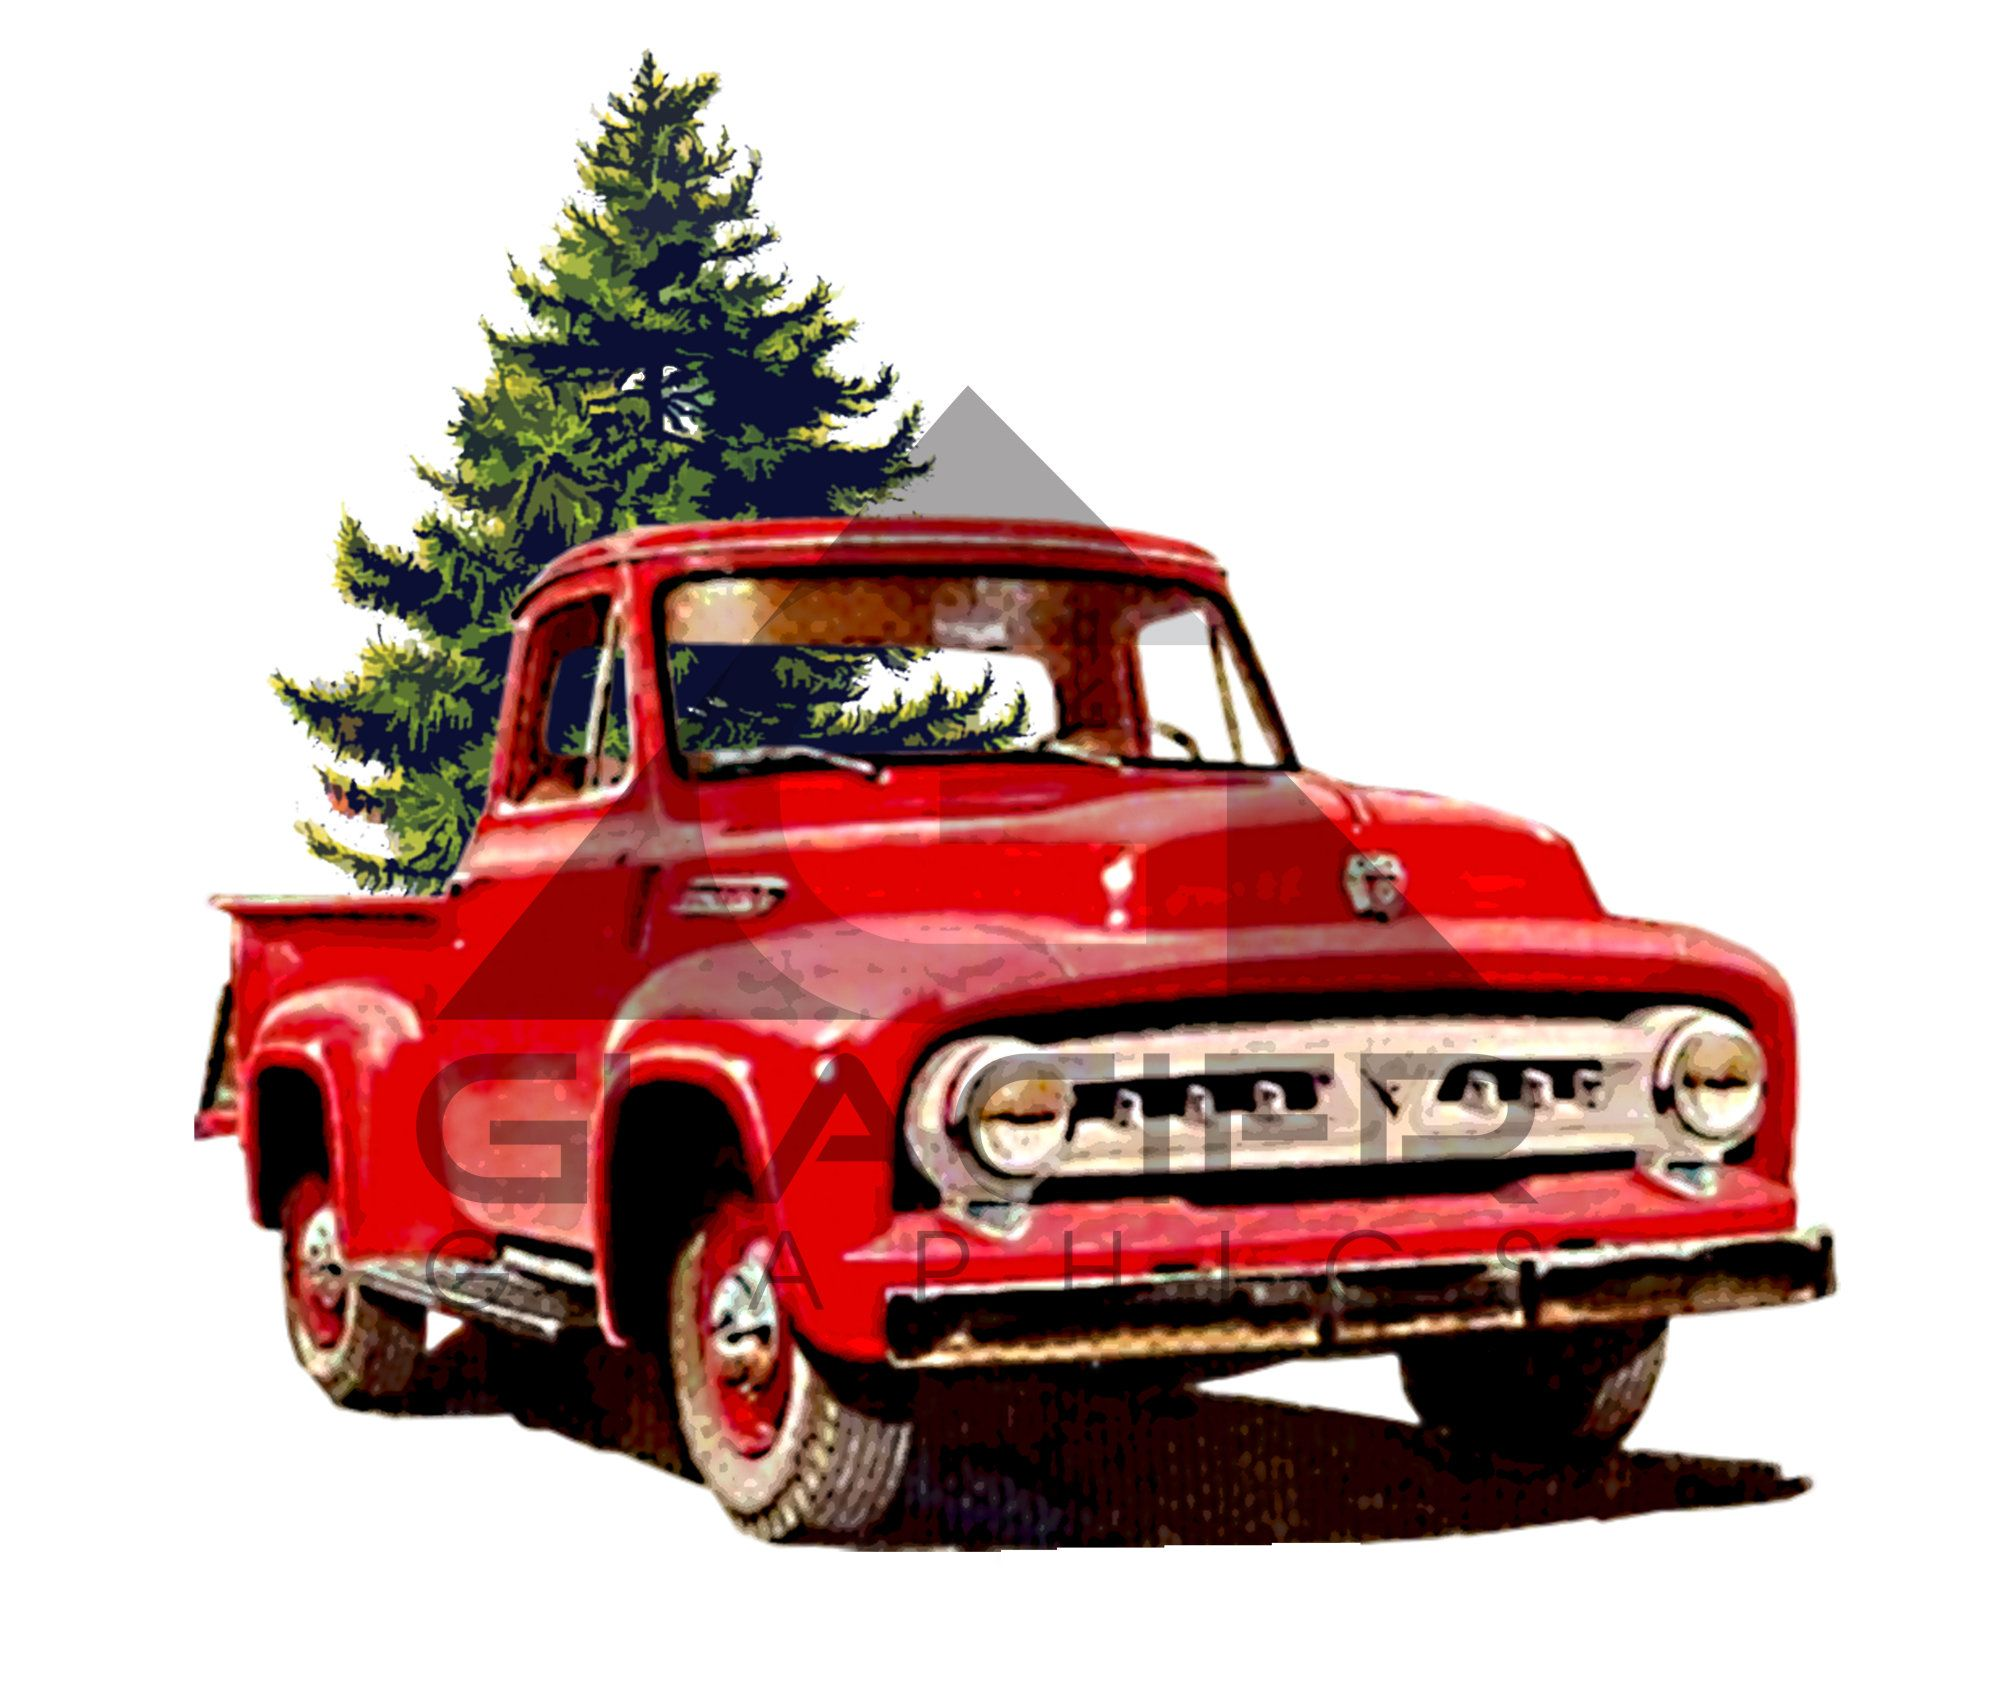 Vintage Red Ford Truck Christmas Tree Farm Png File Etsy Vintage Truck Christmas Christmas Truck Big Christmas Tree